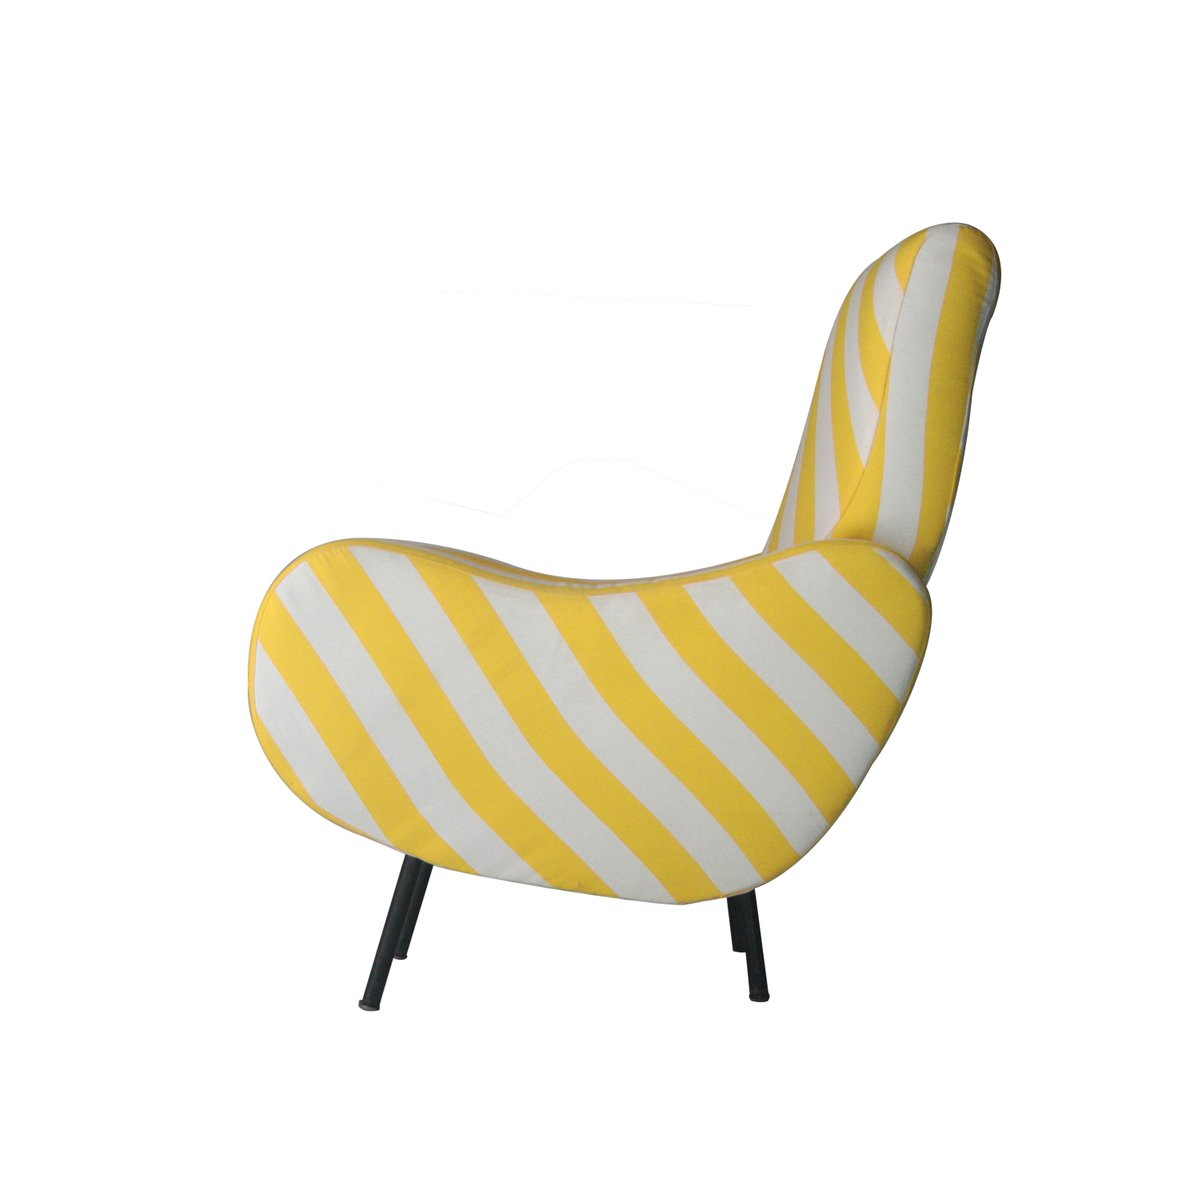 sessel mit fu st tze set 1960er bei pamono kaufen. Black Bedroom Furniture Sets. Home Design Ideas